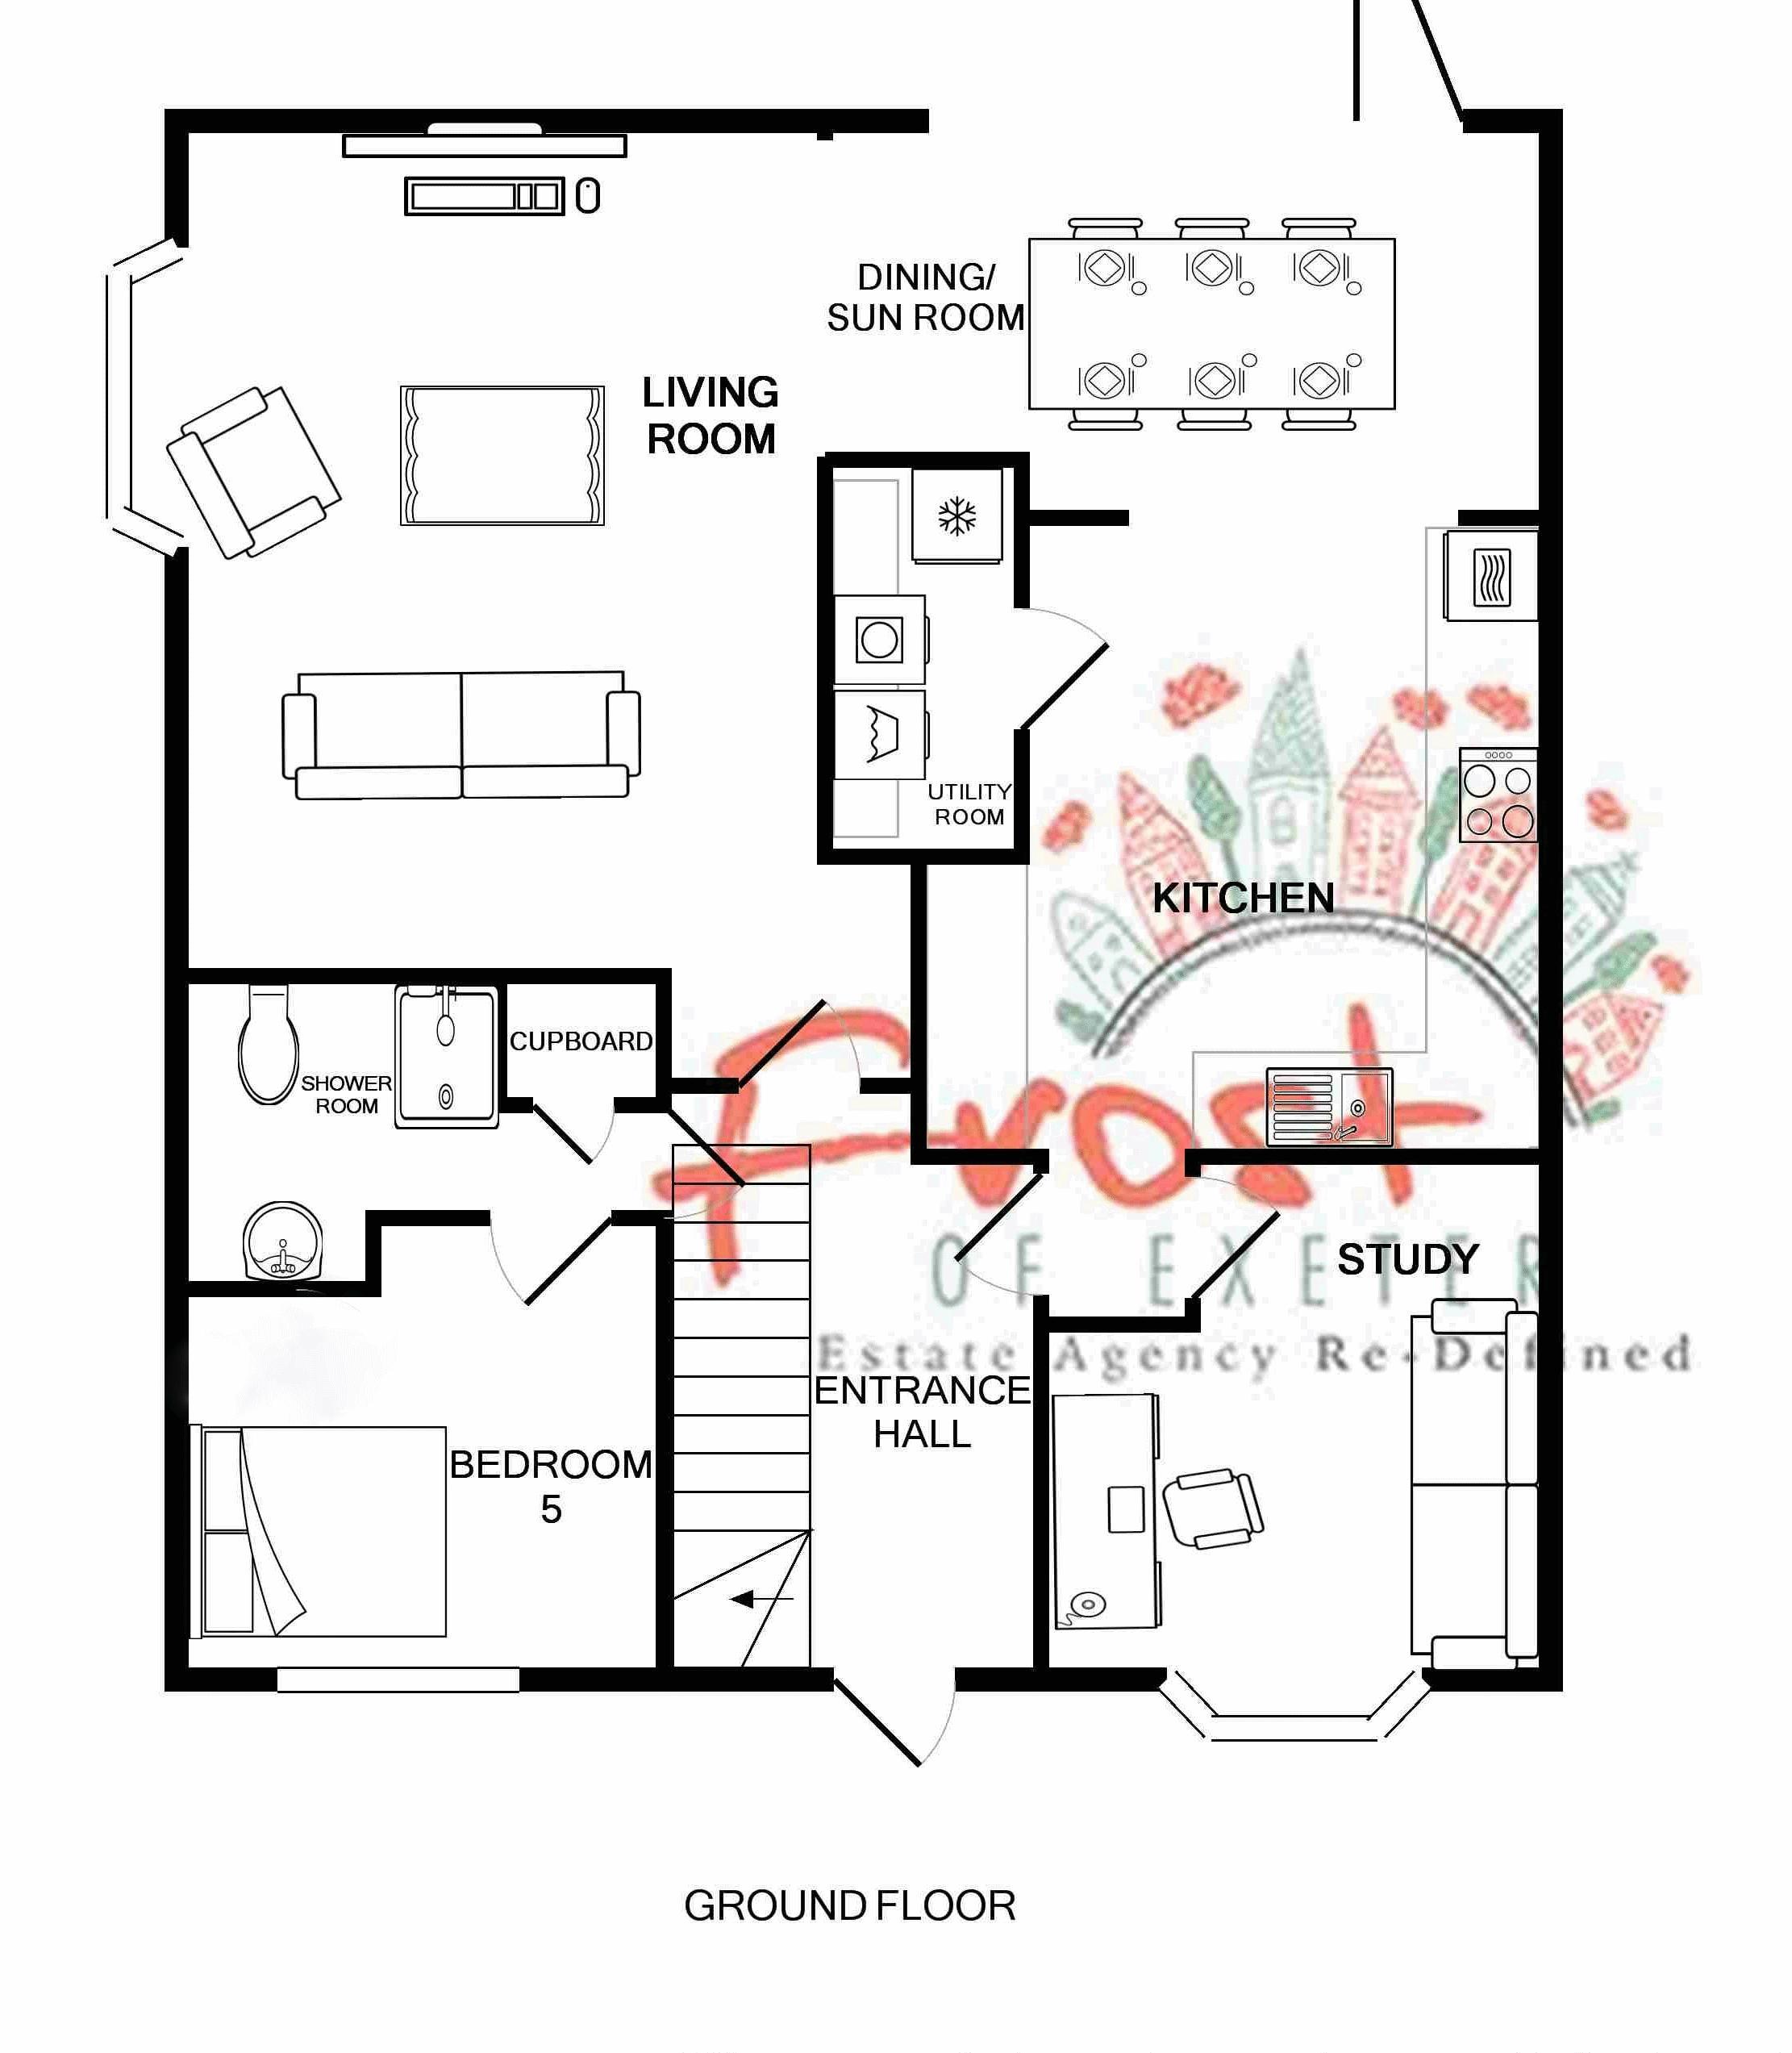 Kenmore Dryer Wiring Diagram 41797912701 - Wiring Diagram K9 on